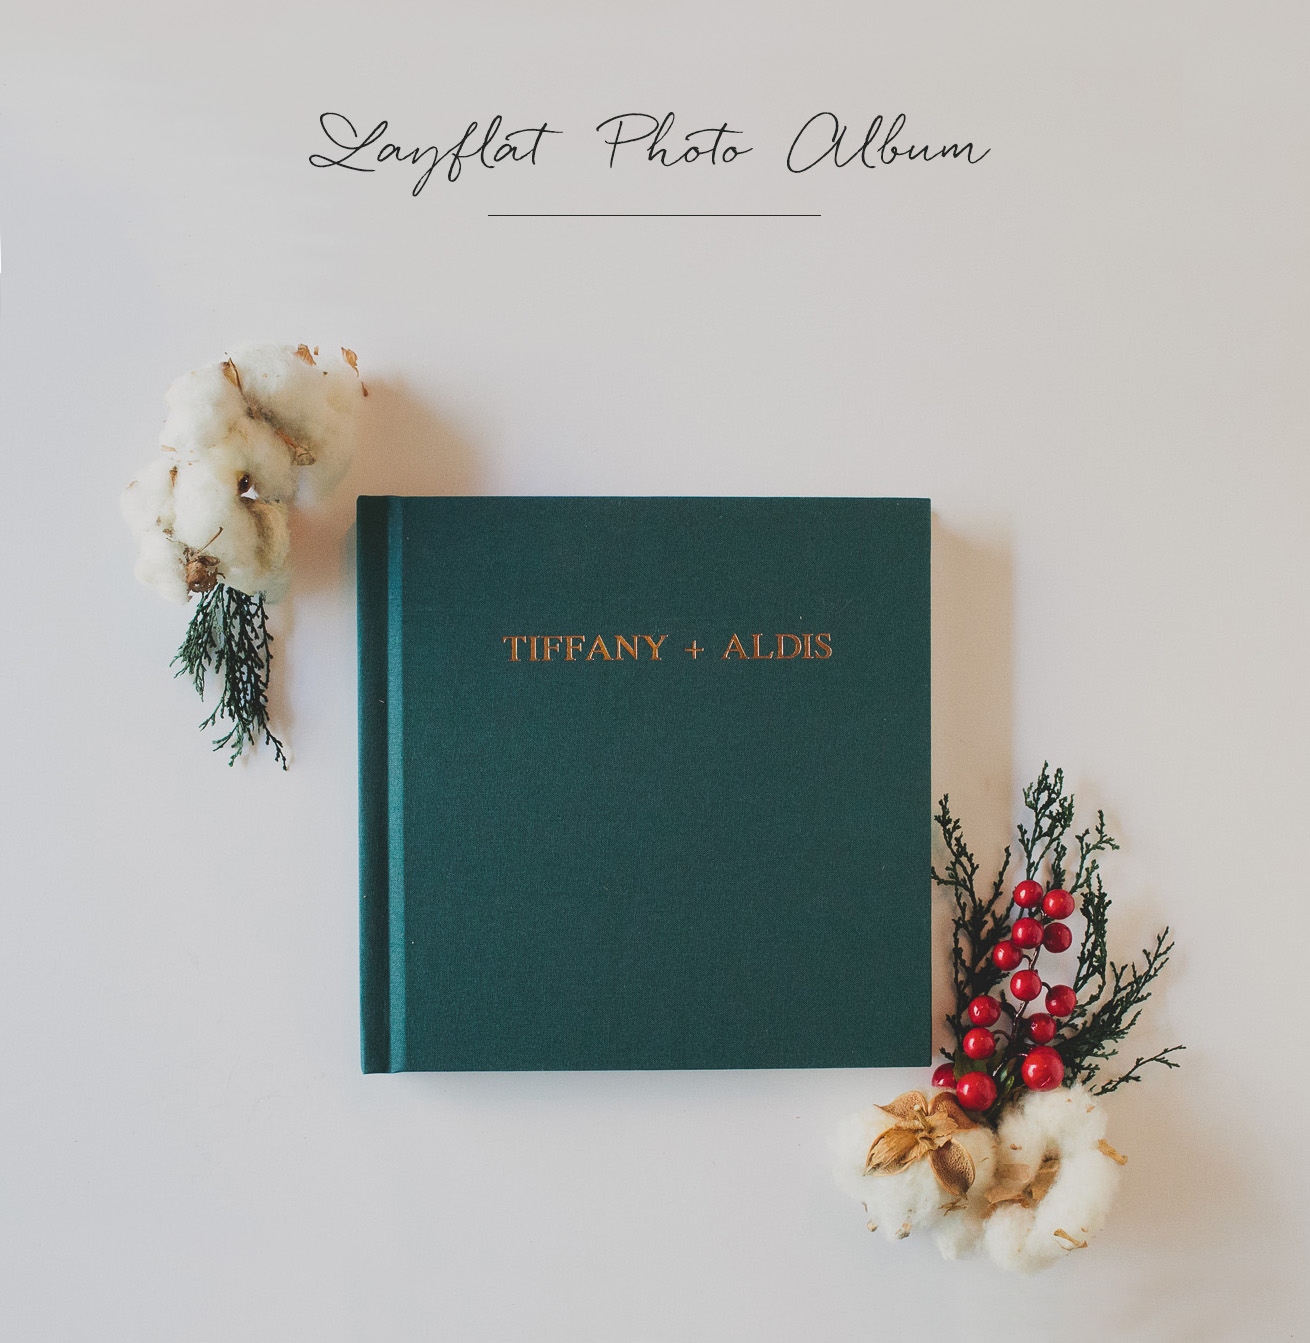 Flatlay Wedding Album from Artifact Uprising